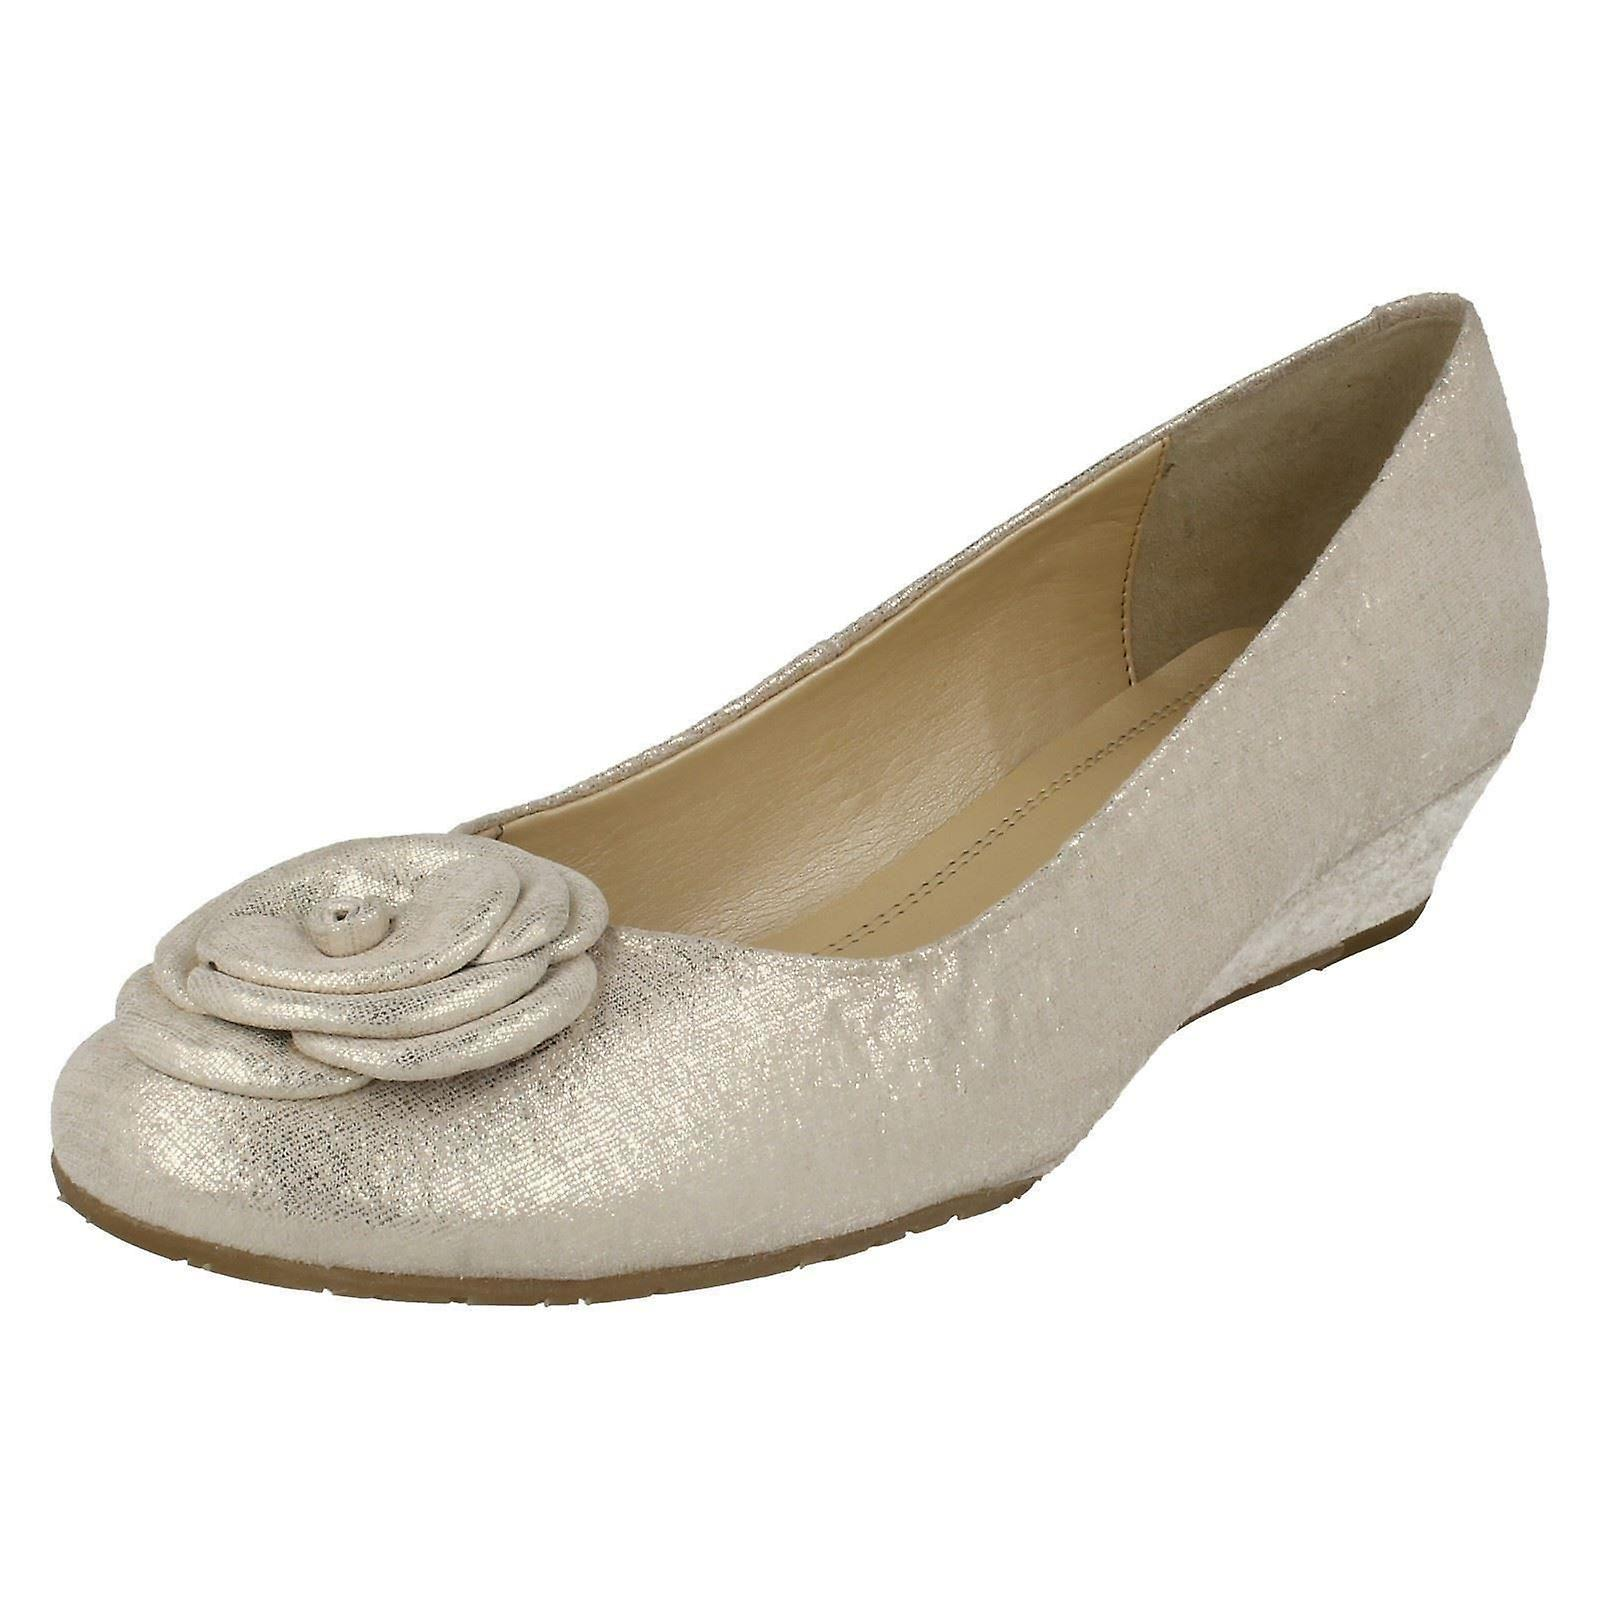 Van Dal Smart Slip dames chaussures Gabriel